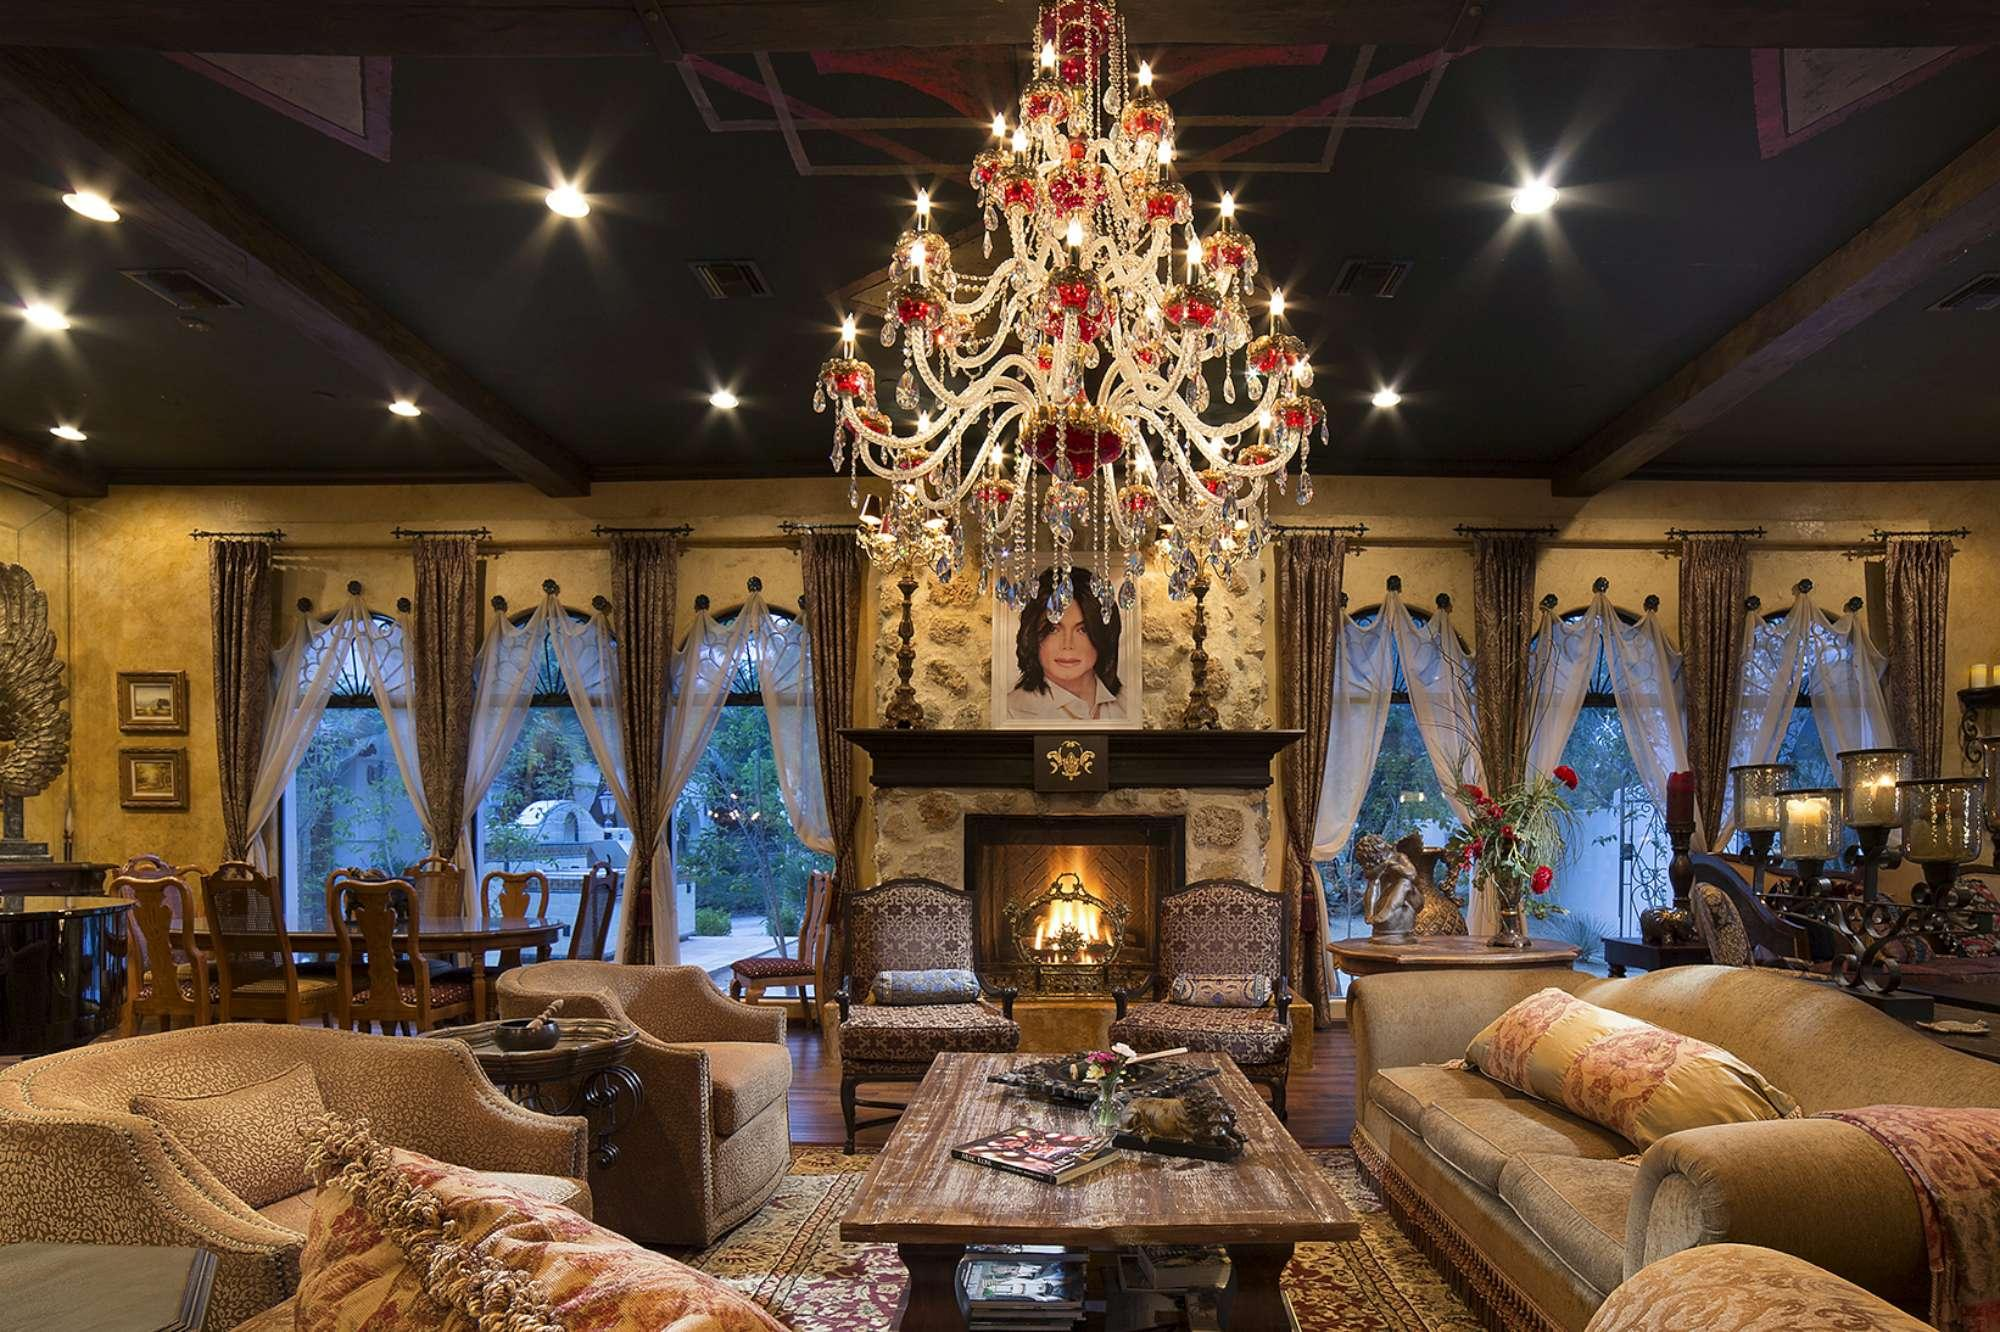 Las vegas in vendita la mega villa di michael jackson per for Mega motors las vegas